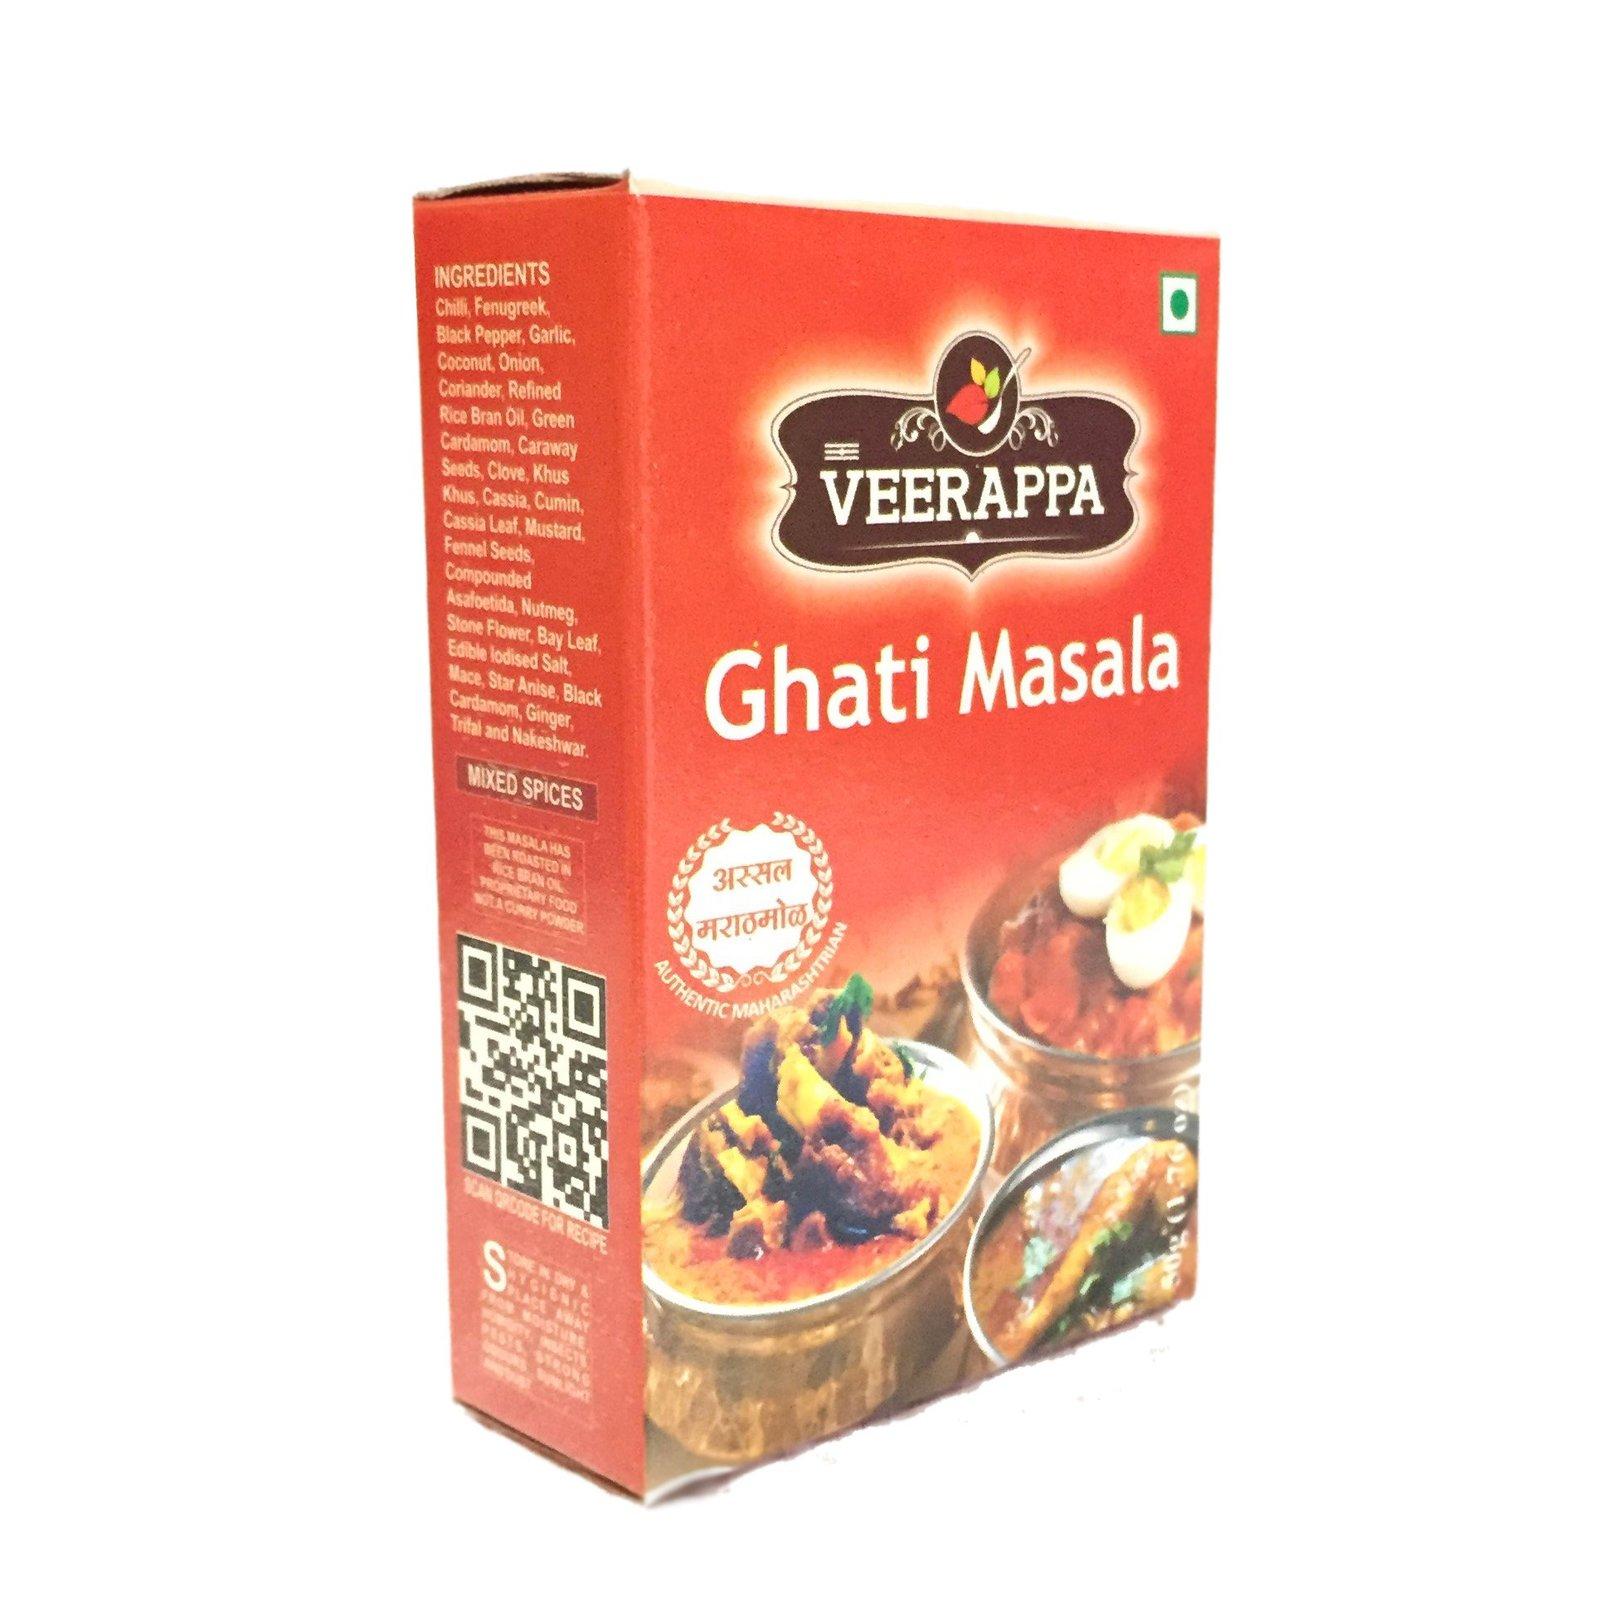 Curry Box (Pack of 4 masala assortments - Ghati, Garam, Mutton, Varhadi)